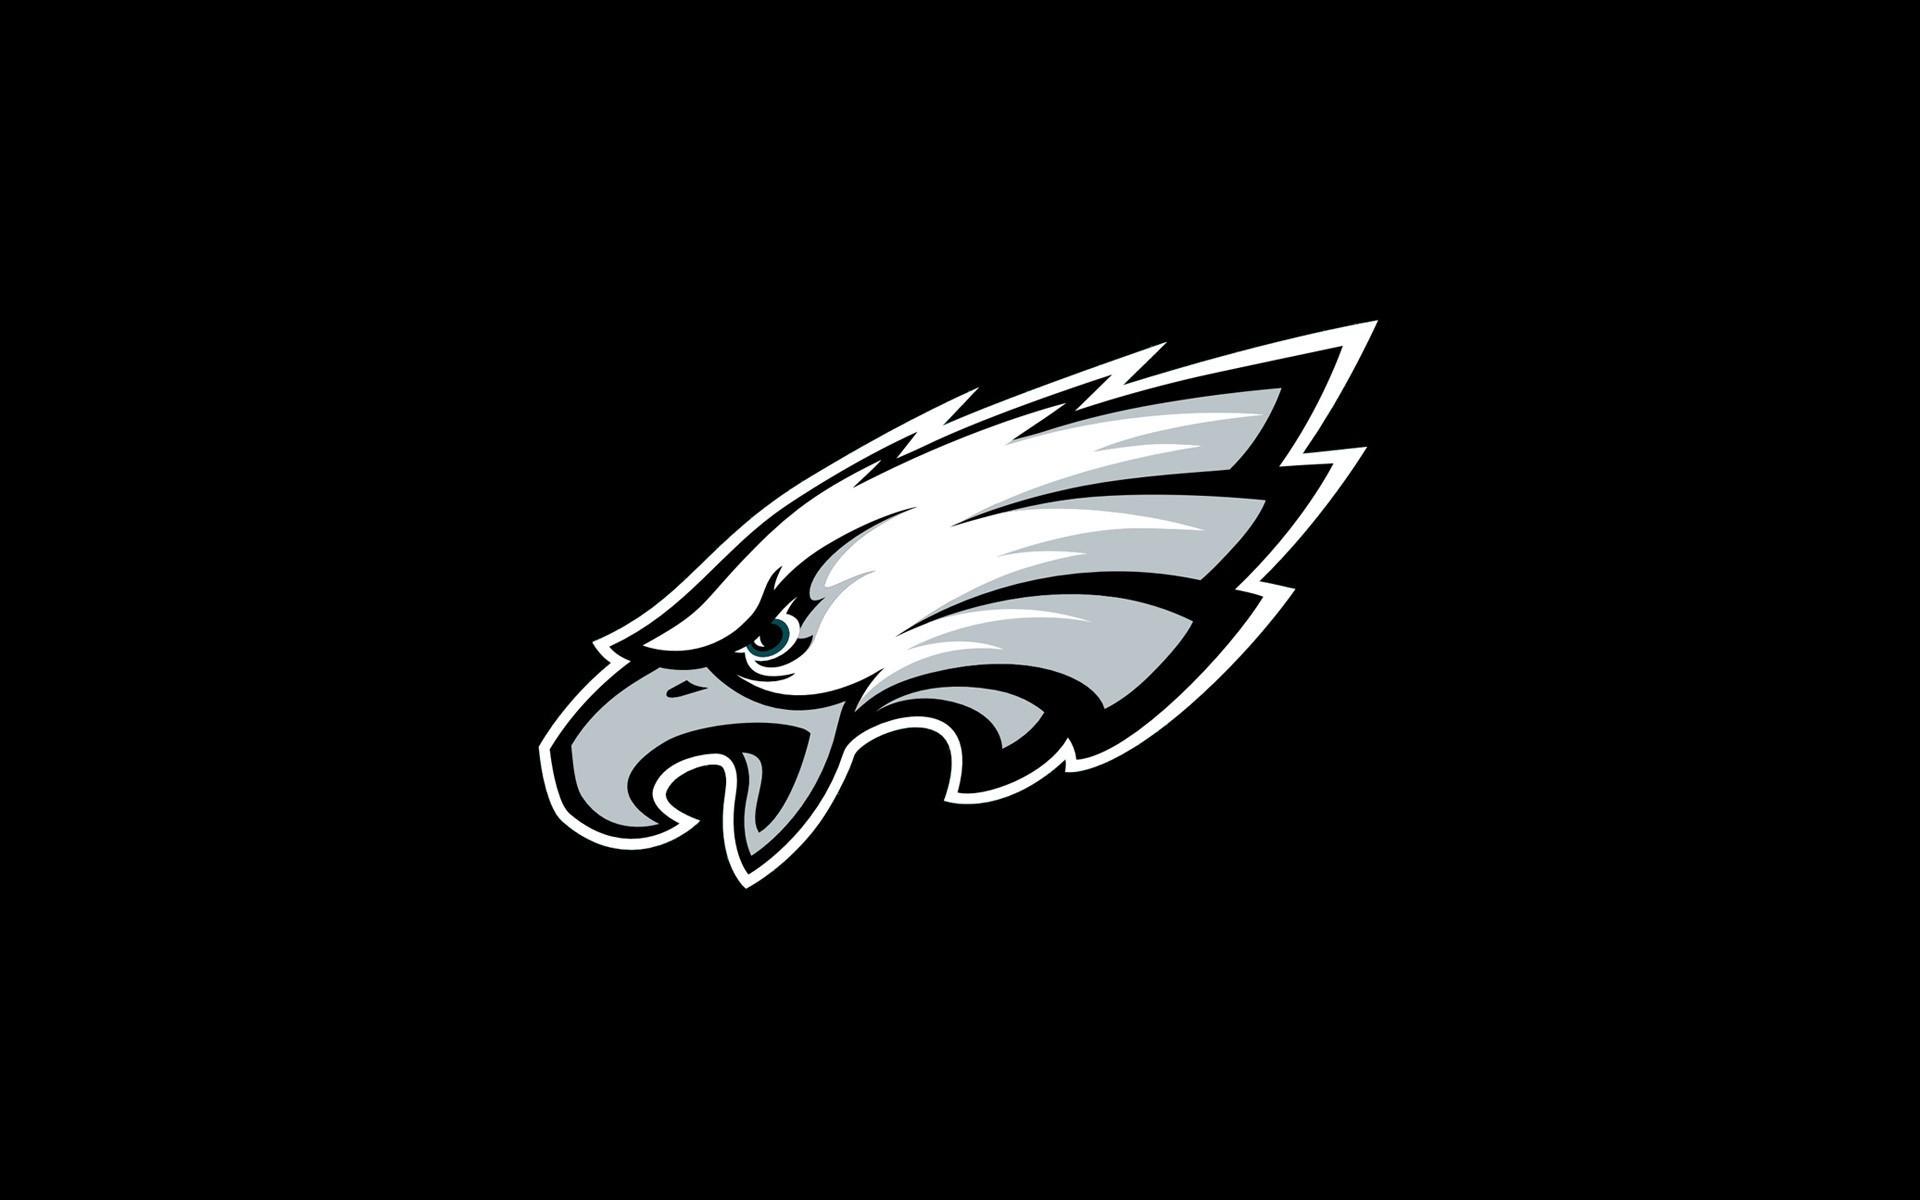 Philadelphia Eagles logo wallpapers HD free download.